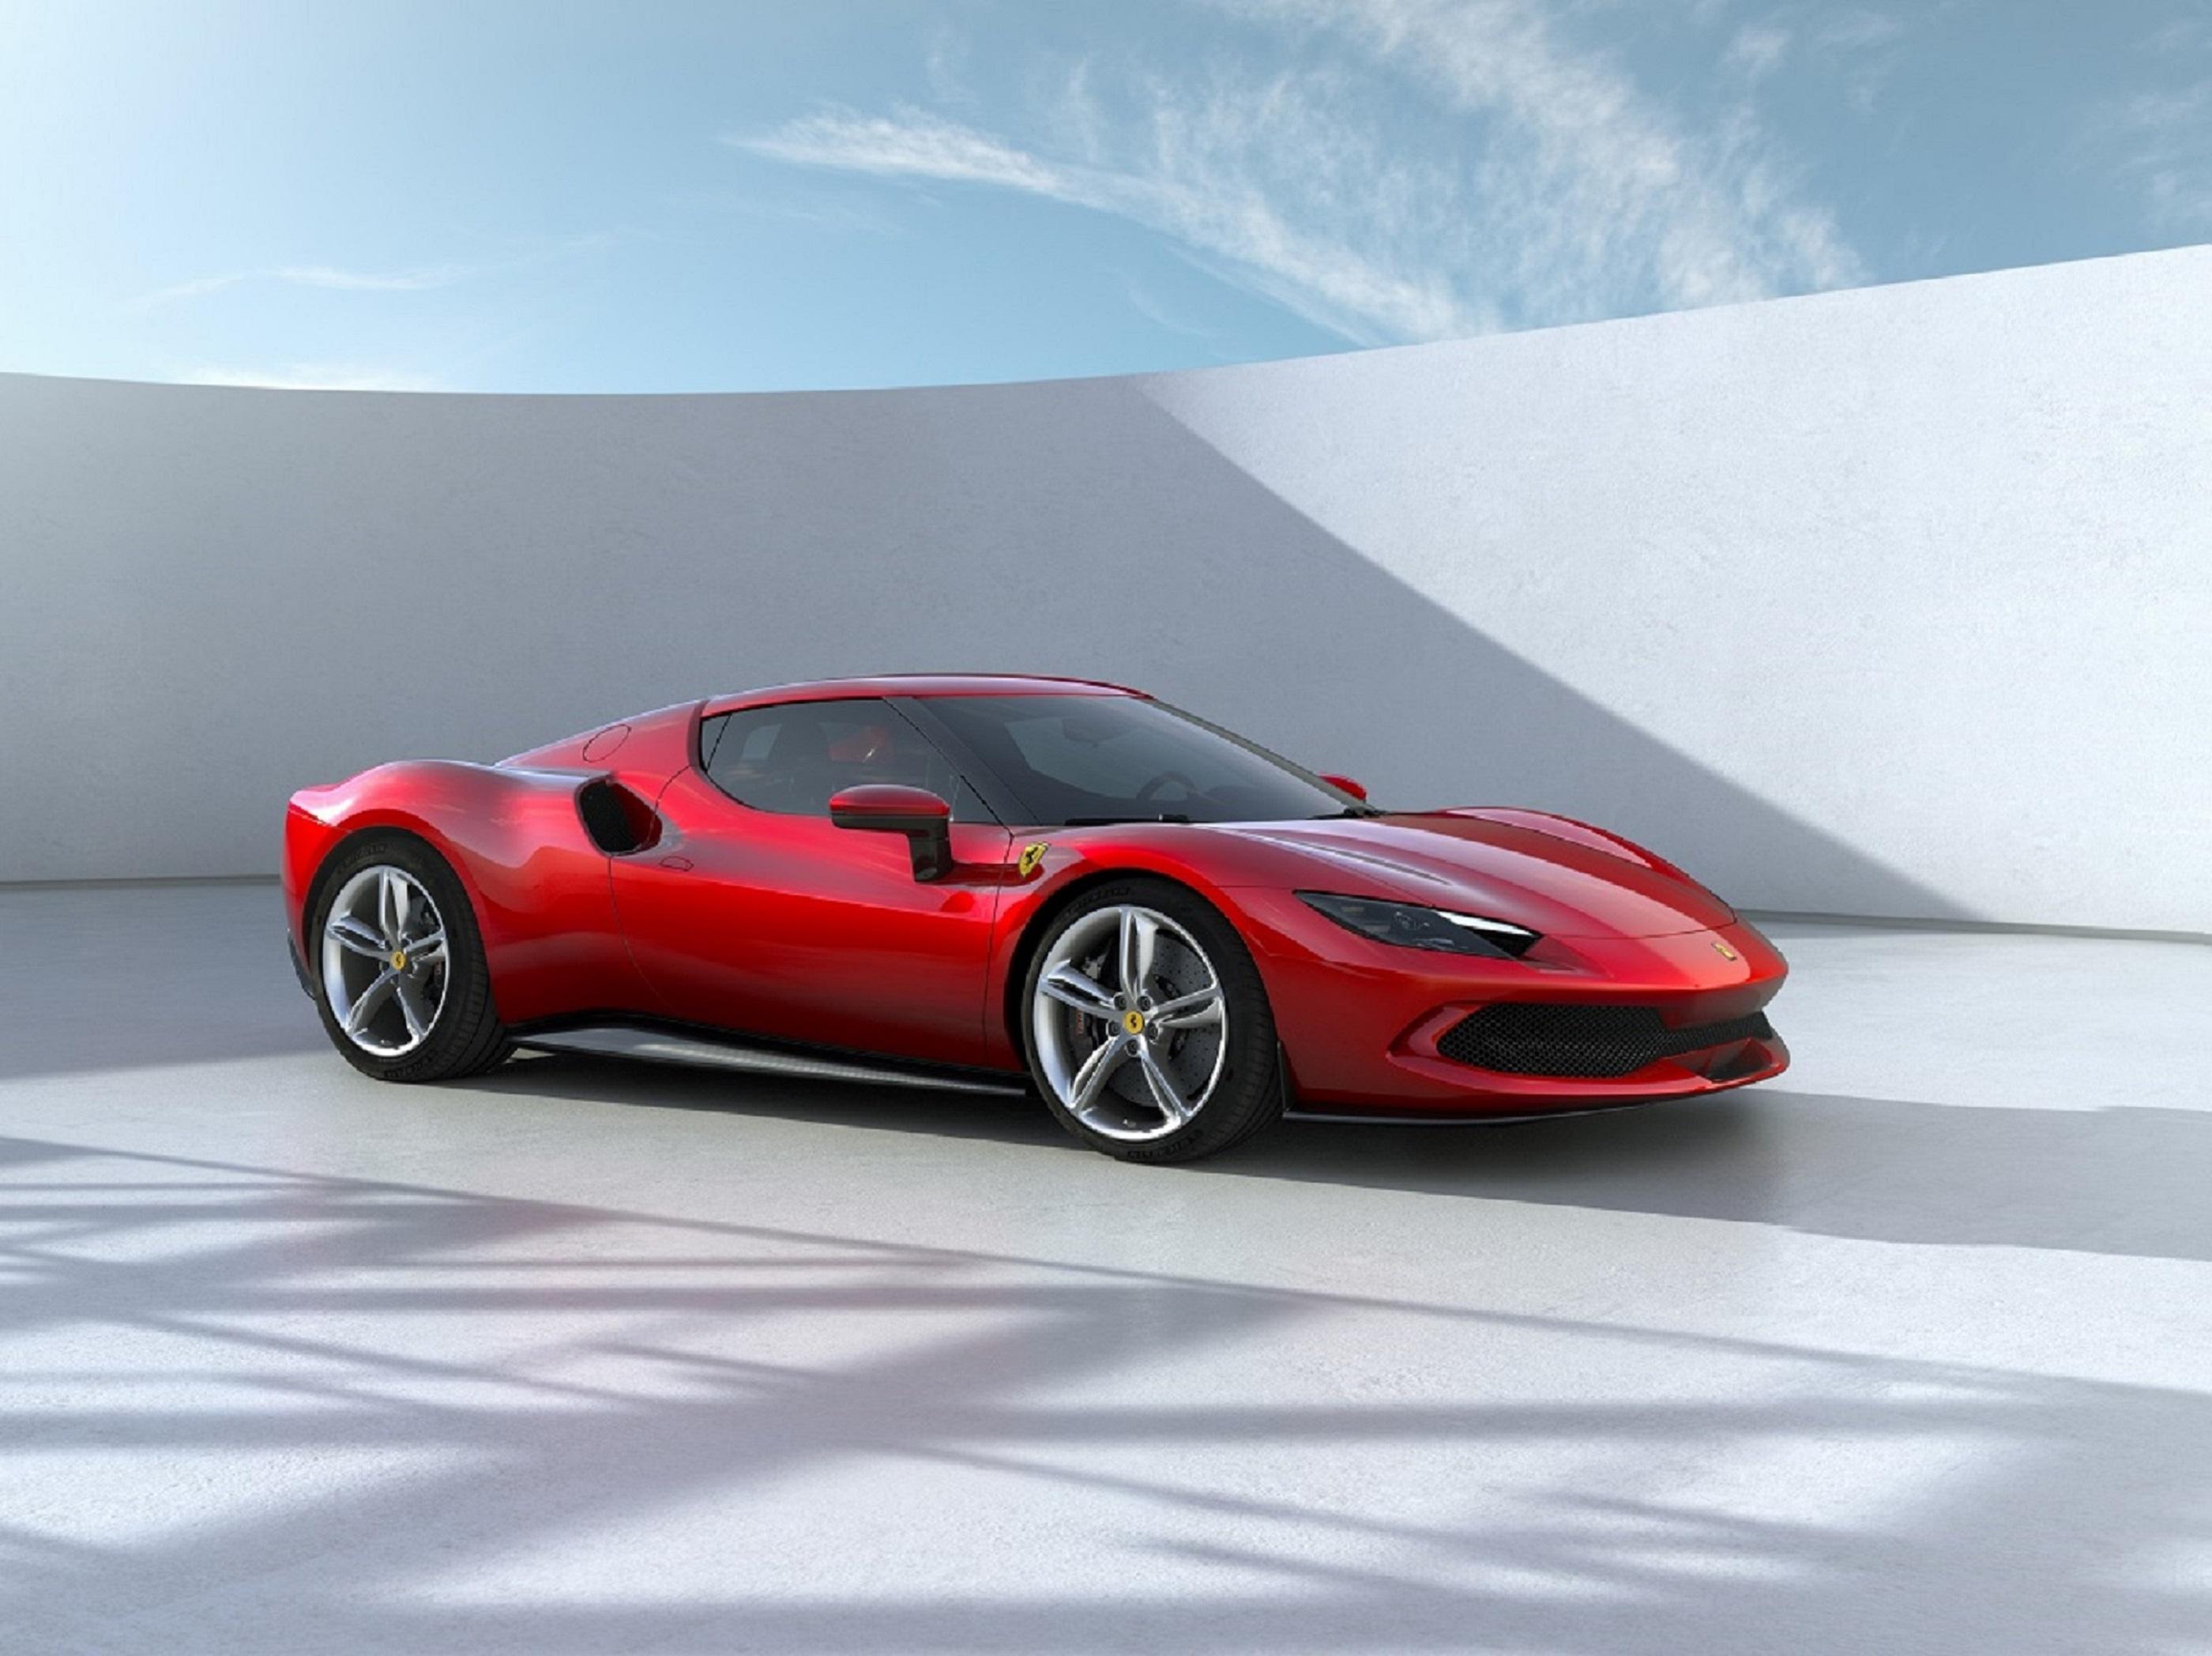 Ferrari Continues Strong Momentum Across All Regions